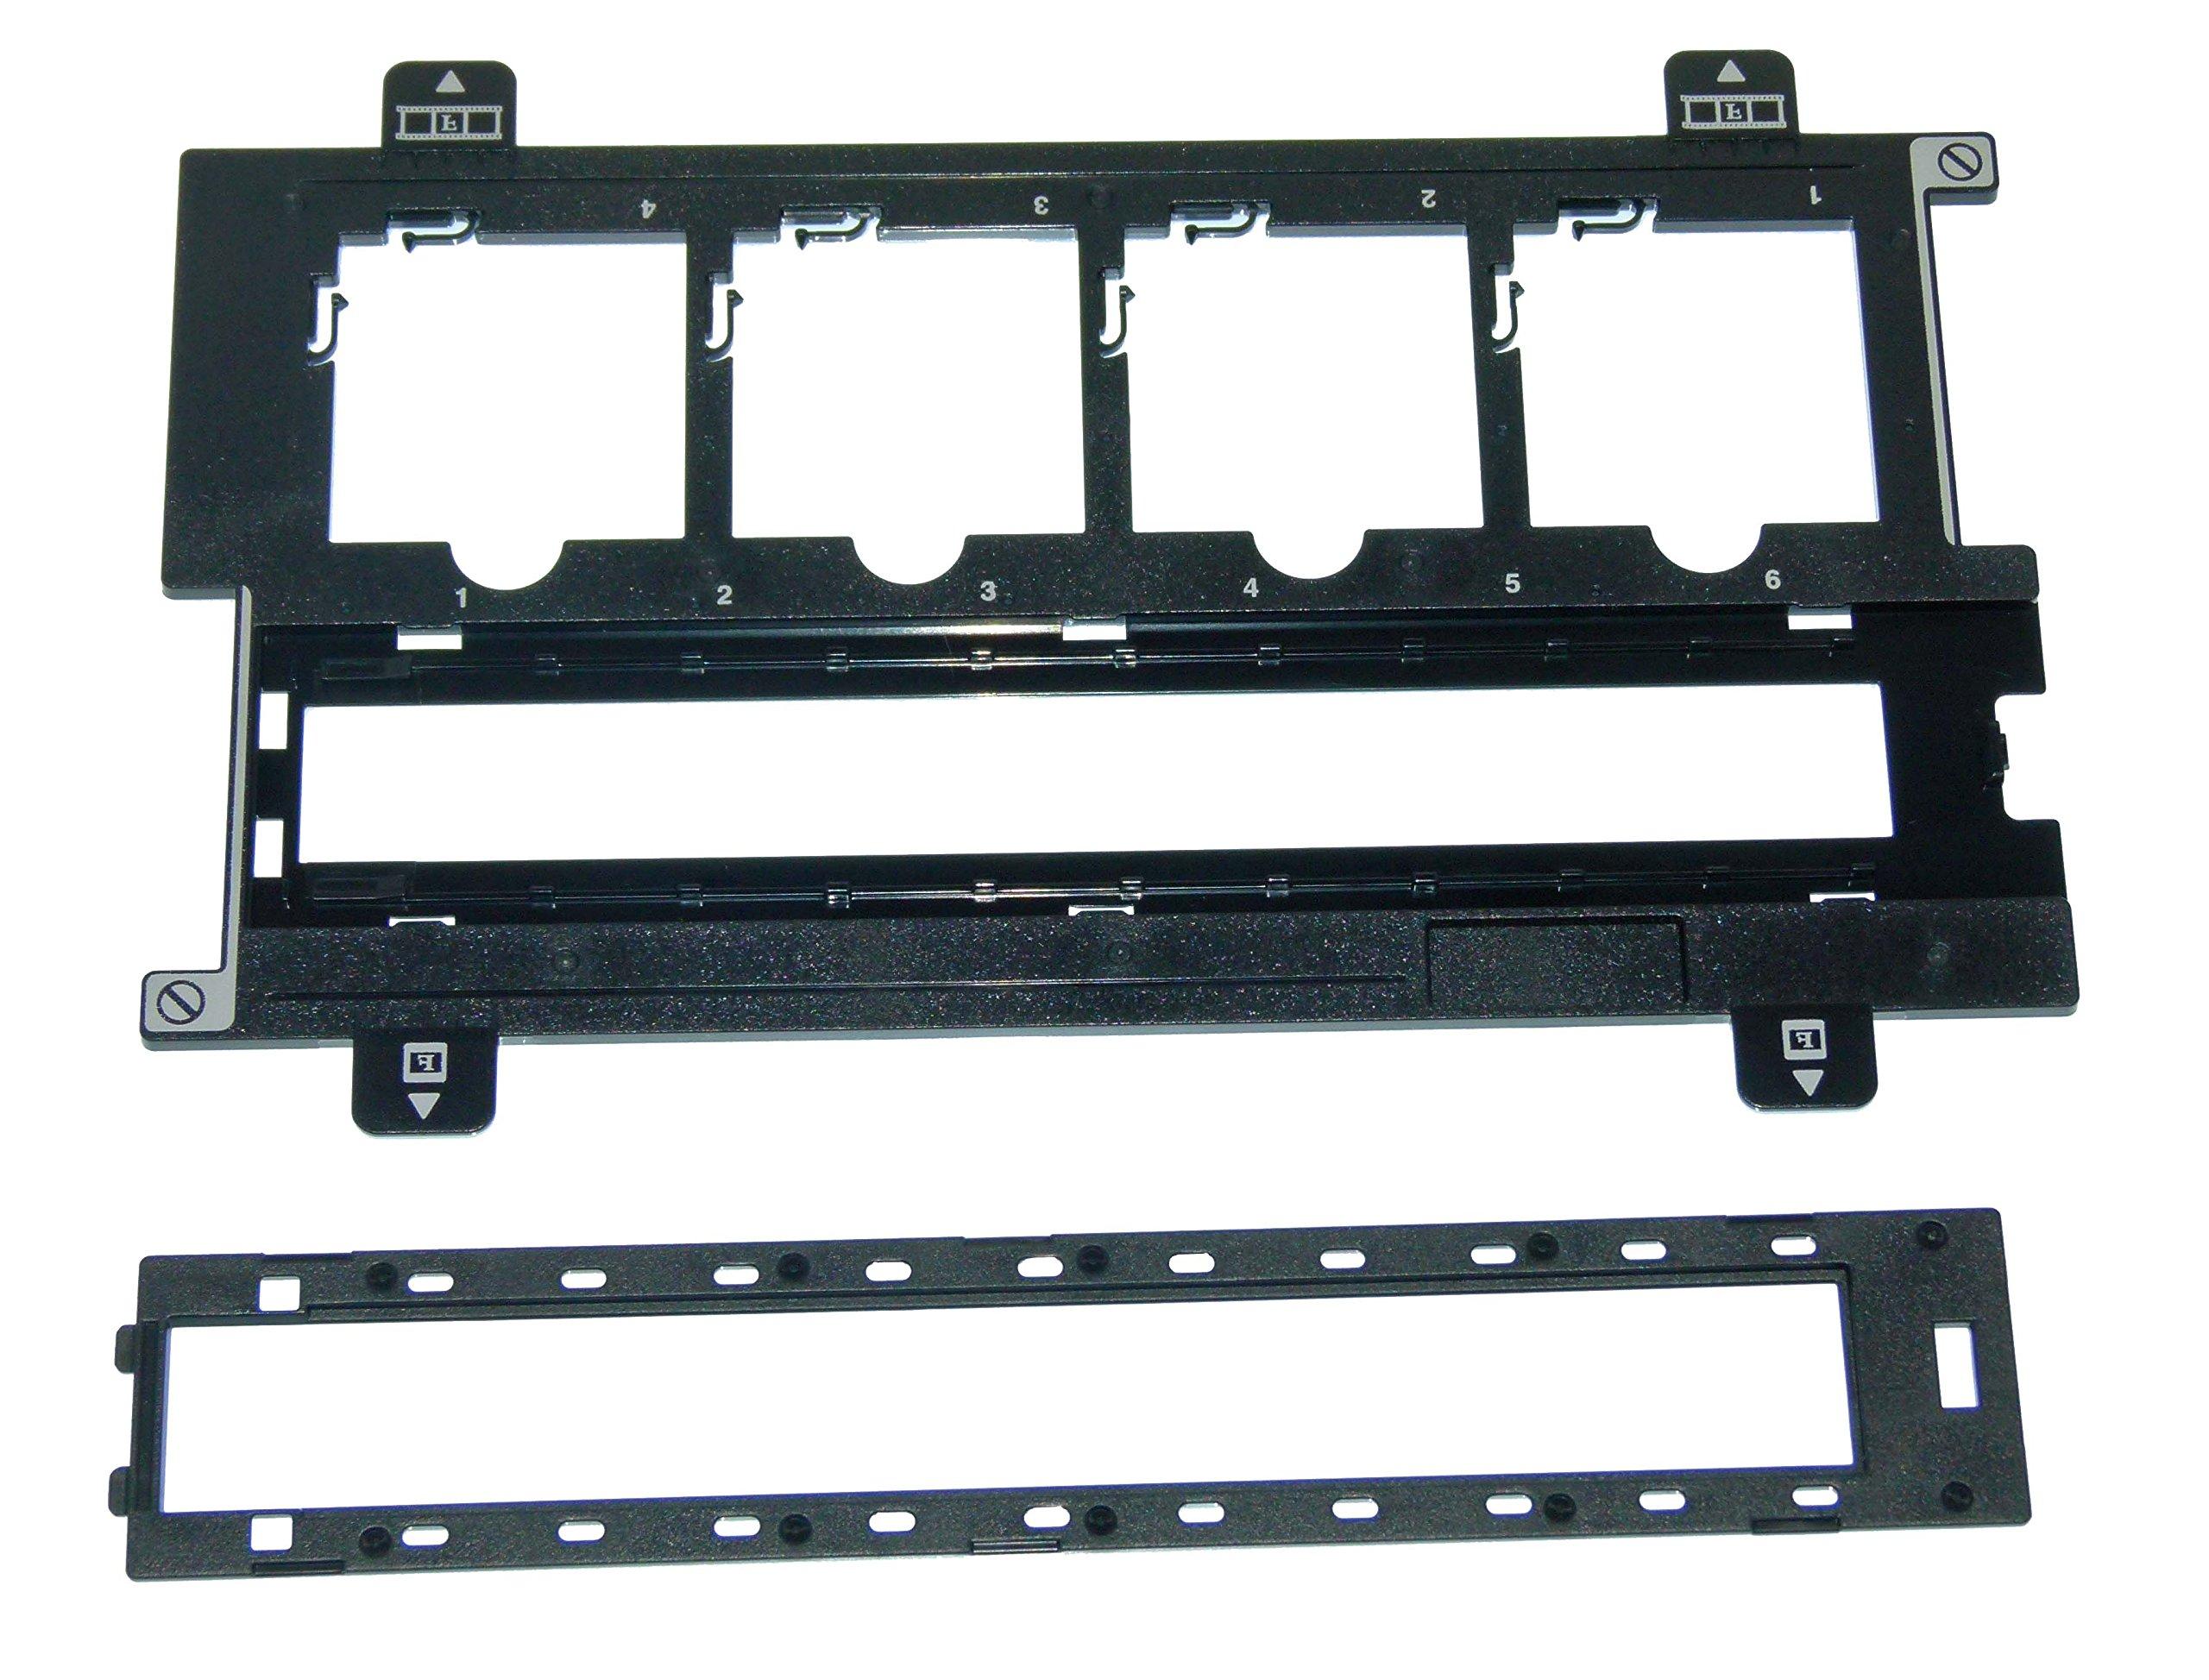 Epson Scanner 35mm Slide & Negative Holder Film Guide: Stylus Photo RX500, RX510, RX600, RX610, RX620, RX630